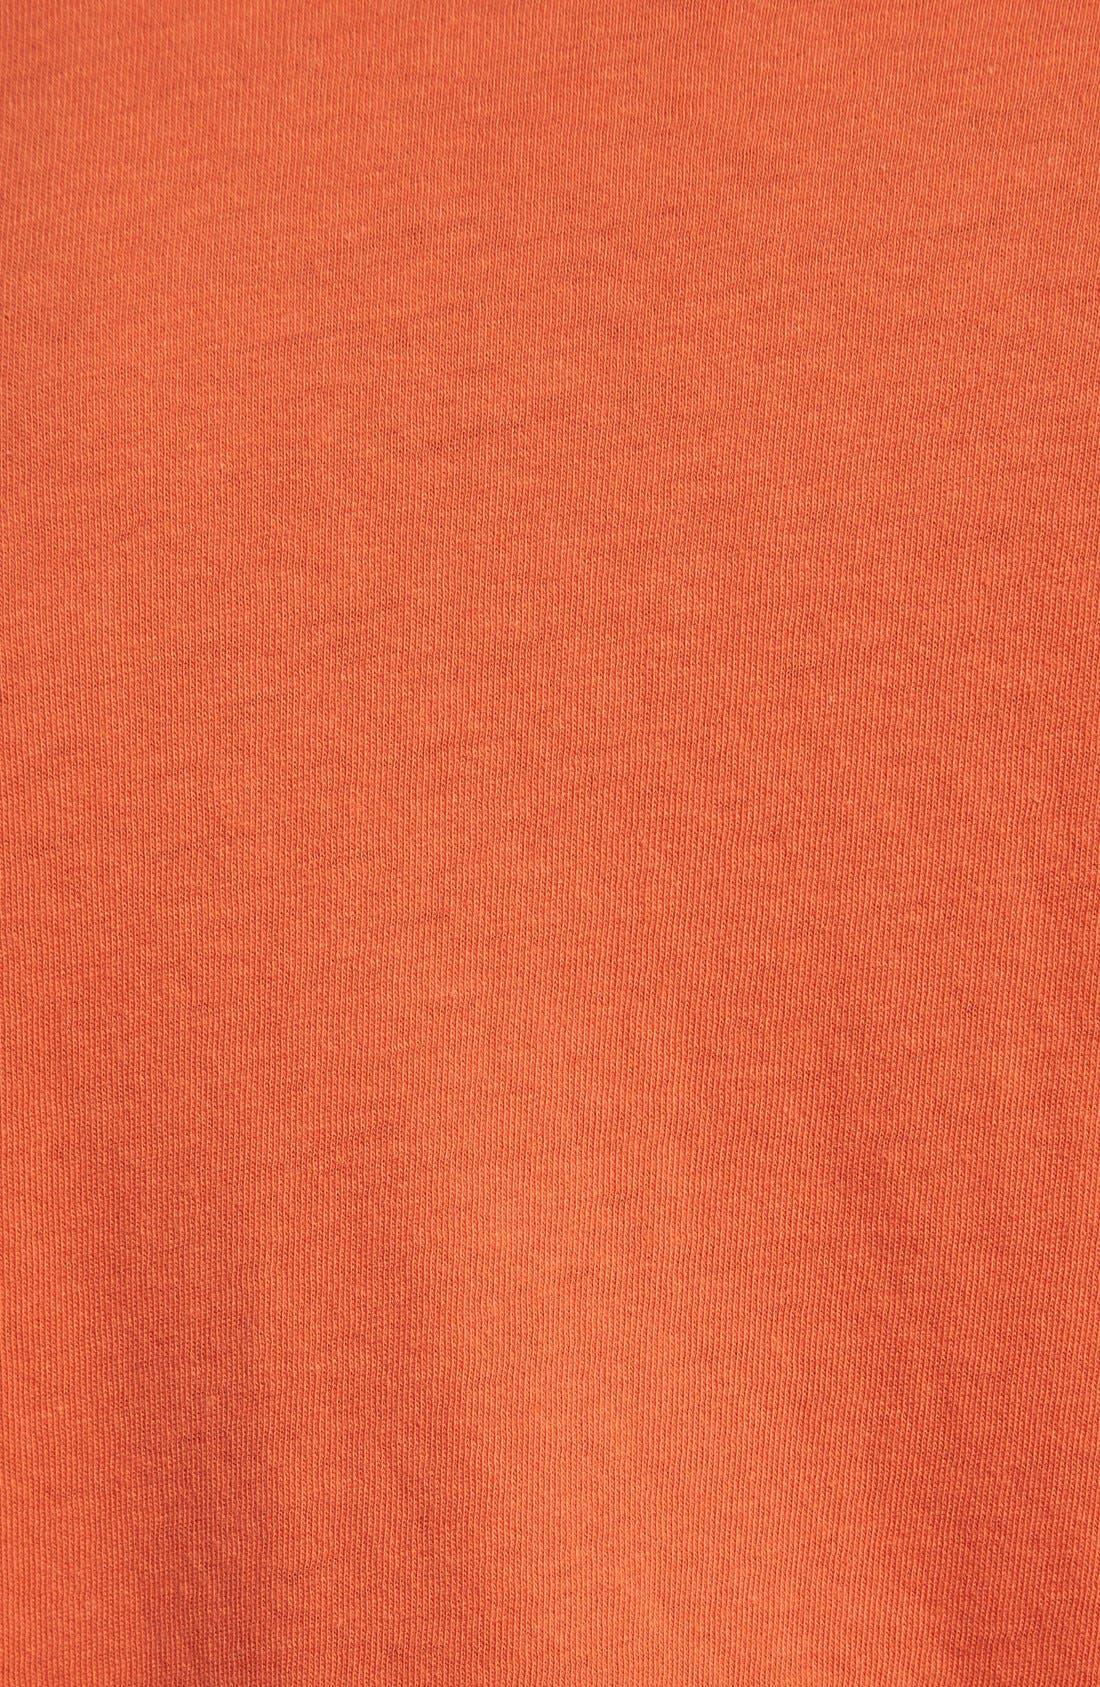 Alternate Image 3  - 47 Brand 'Baltimore Orioles - Flanker' Graphic T-Shirt